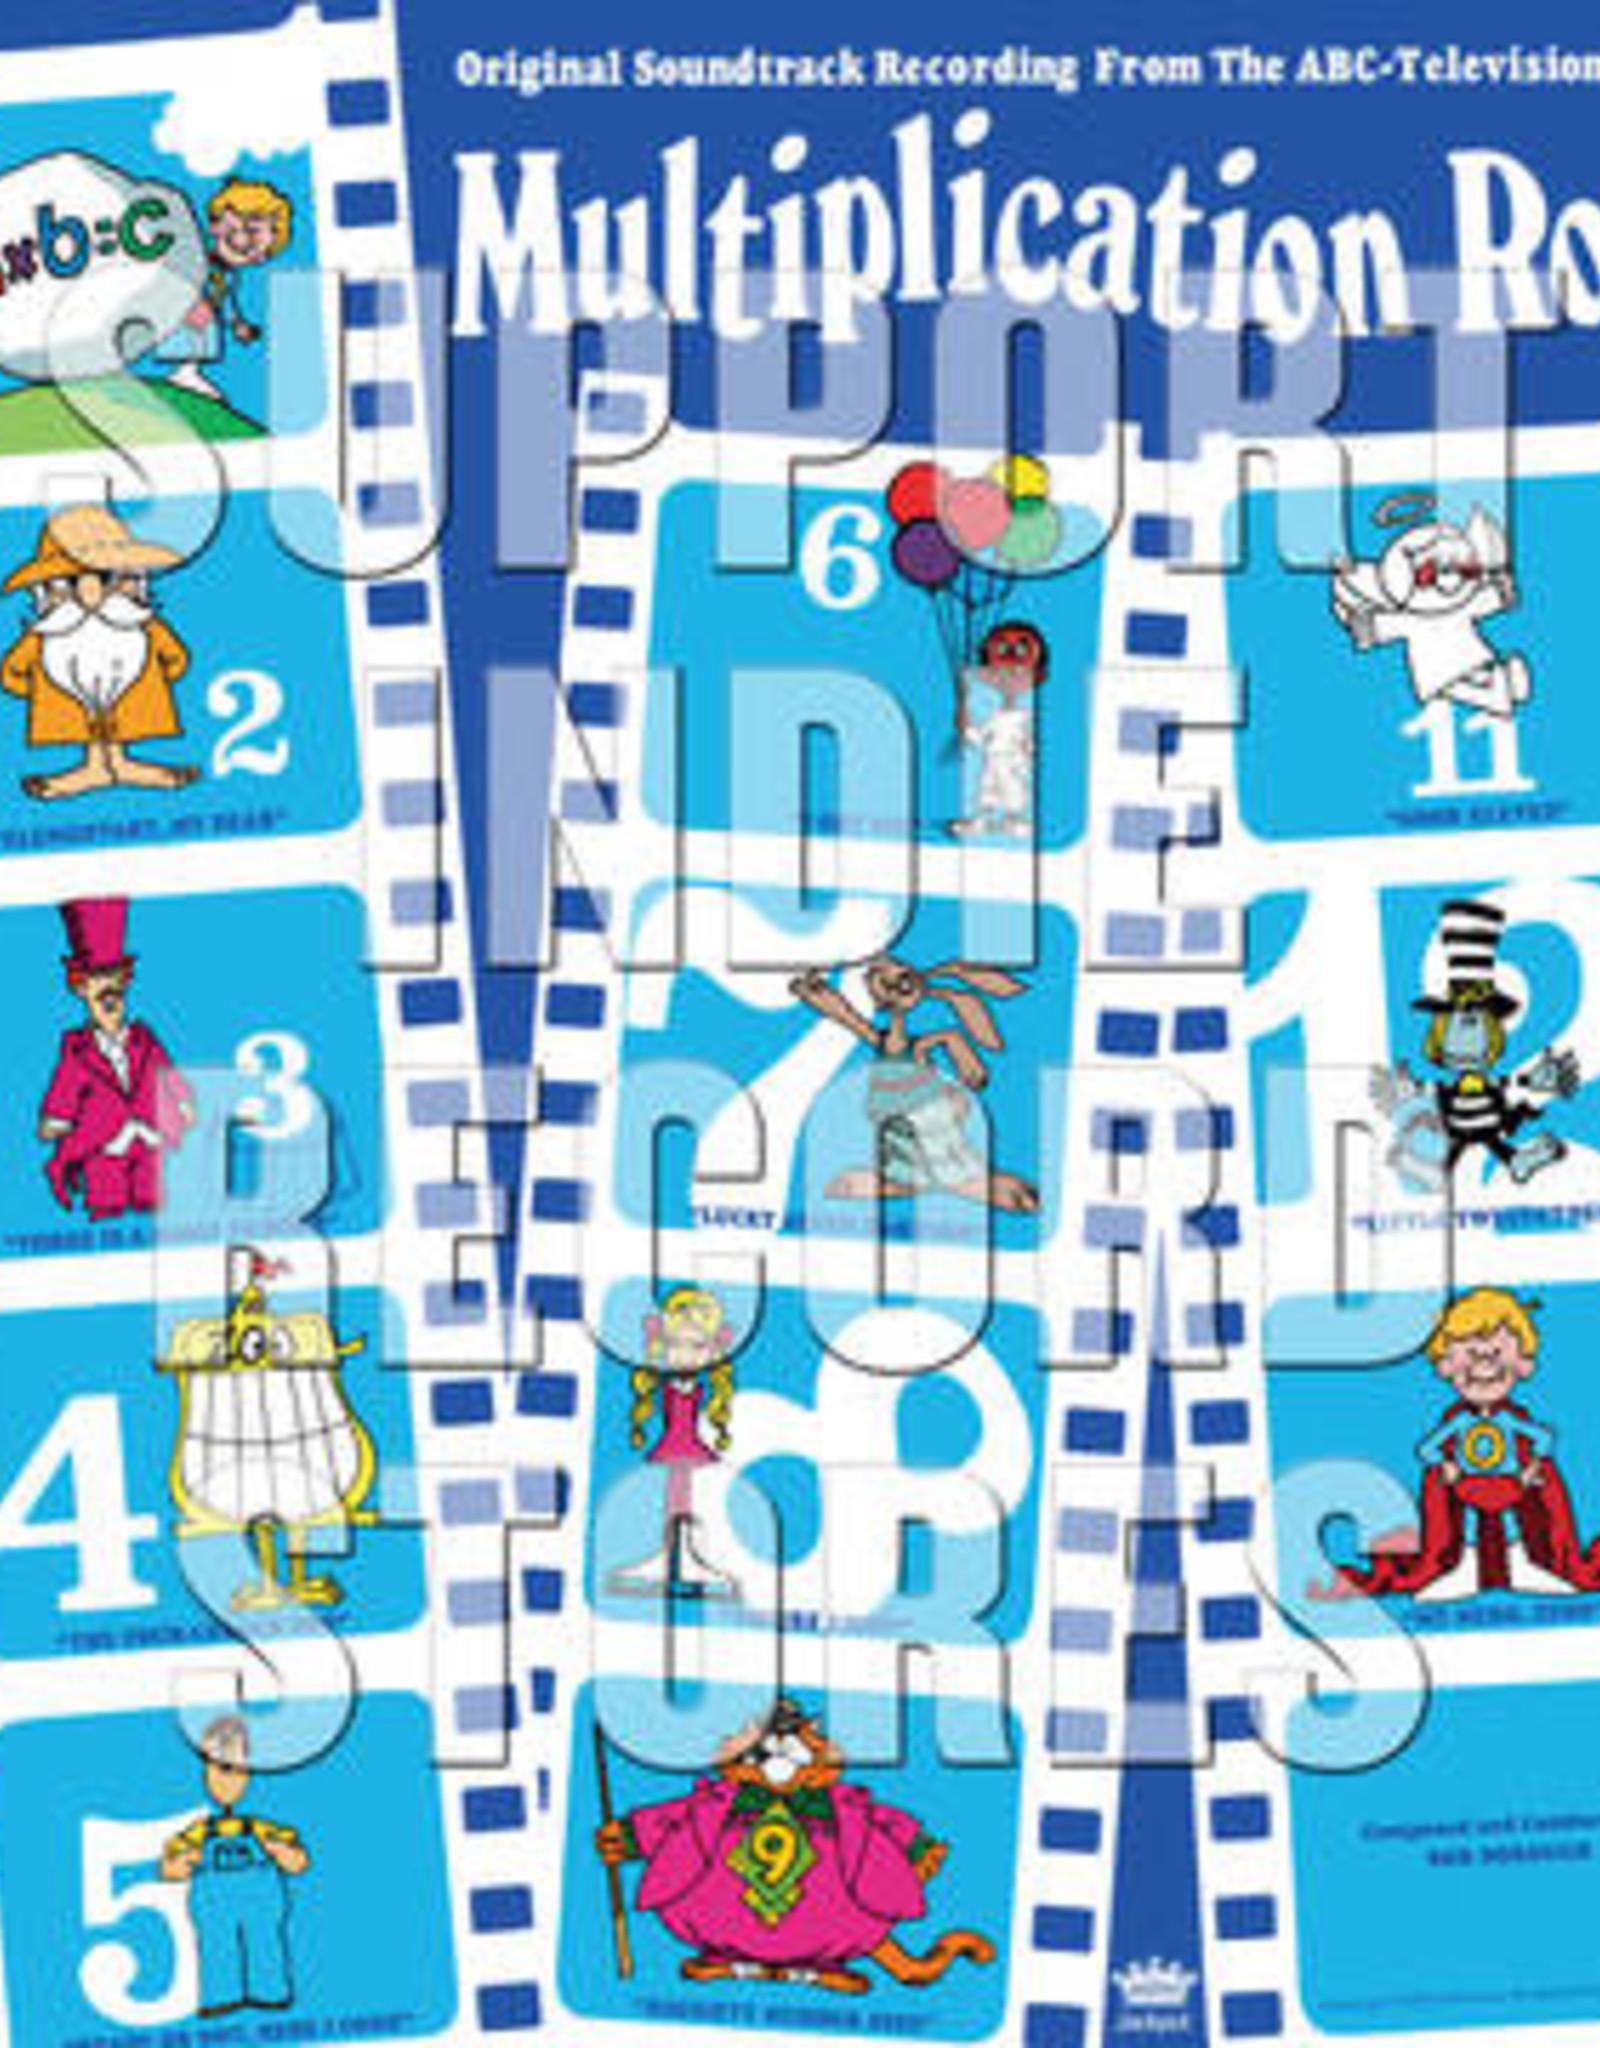 Bob Dorough - Multiplication Rock Ost (Multi Colored Vinyl/Original Artwork) (RSD 2019)